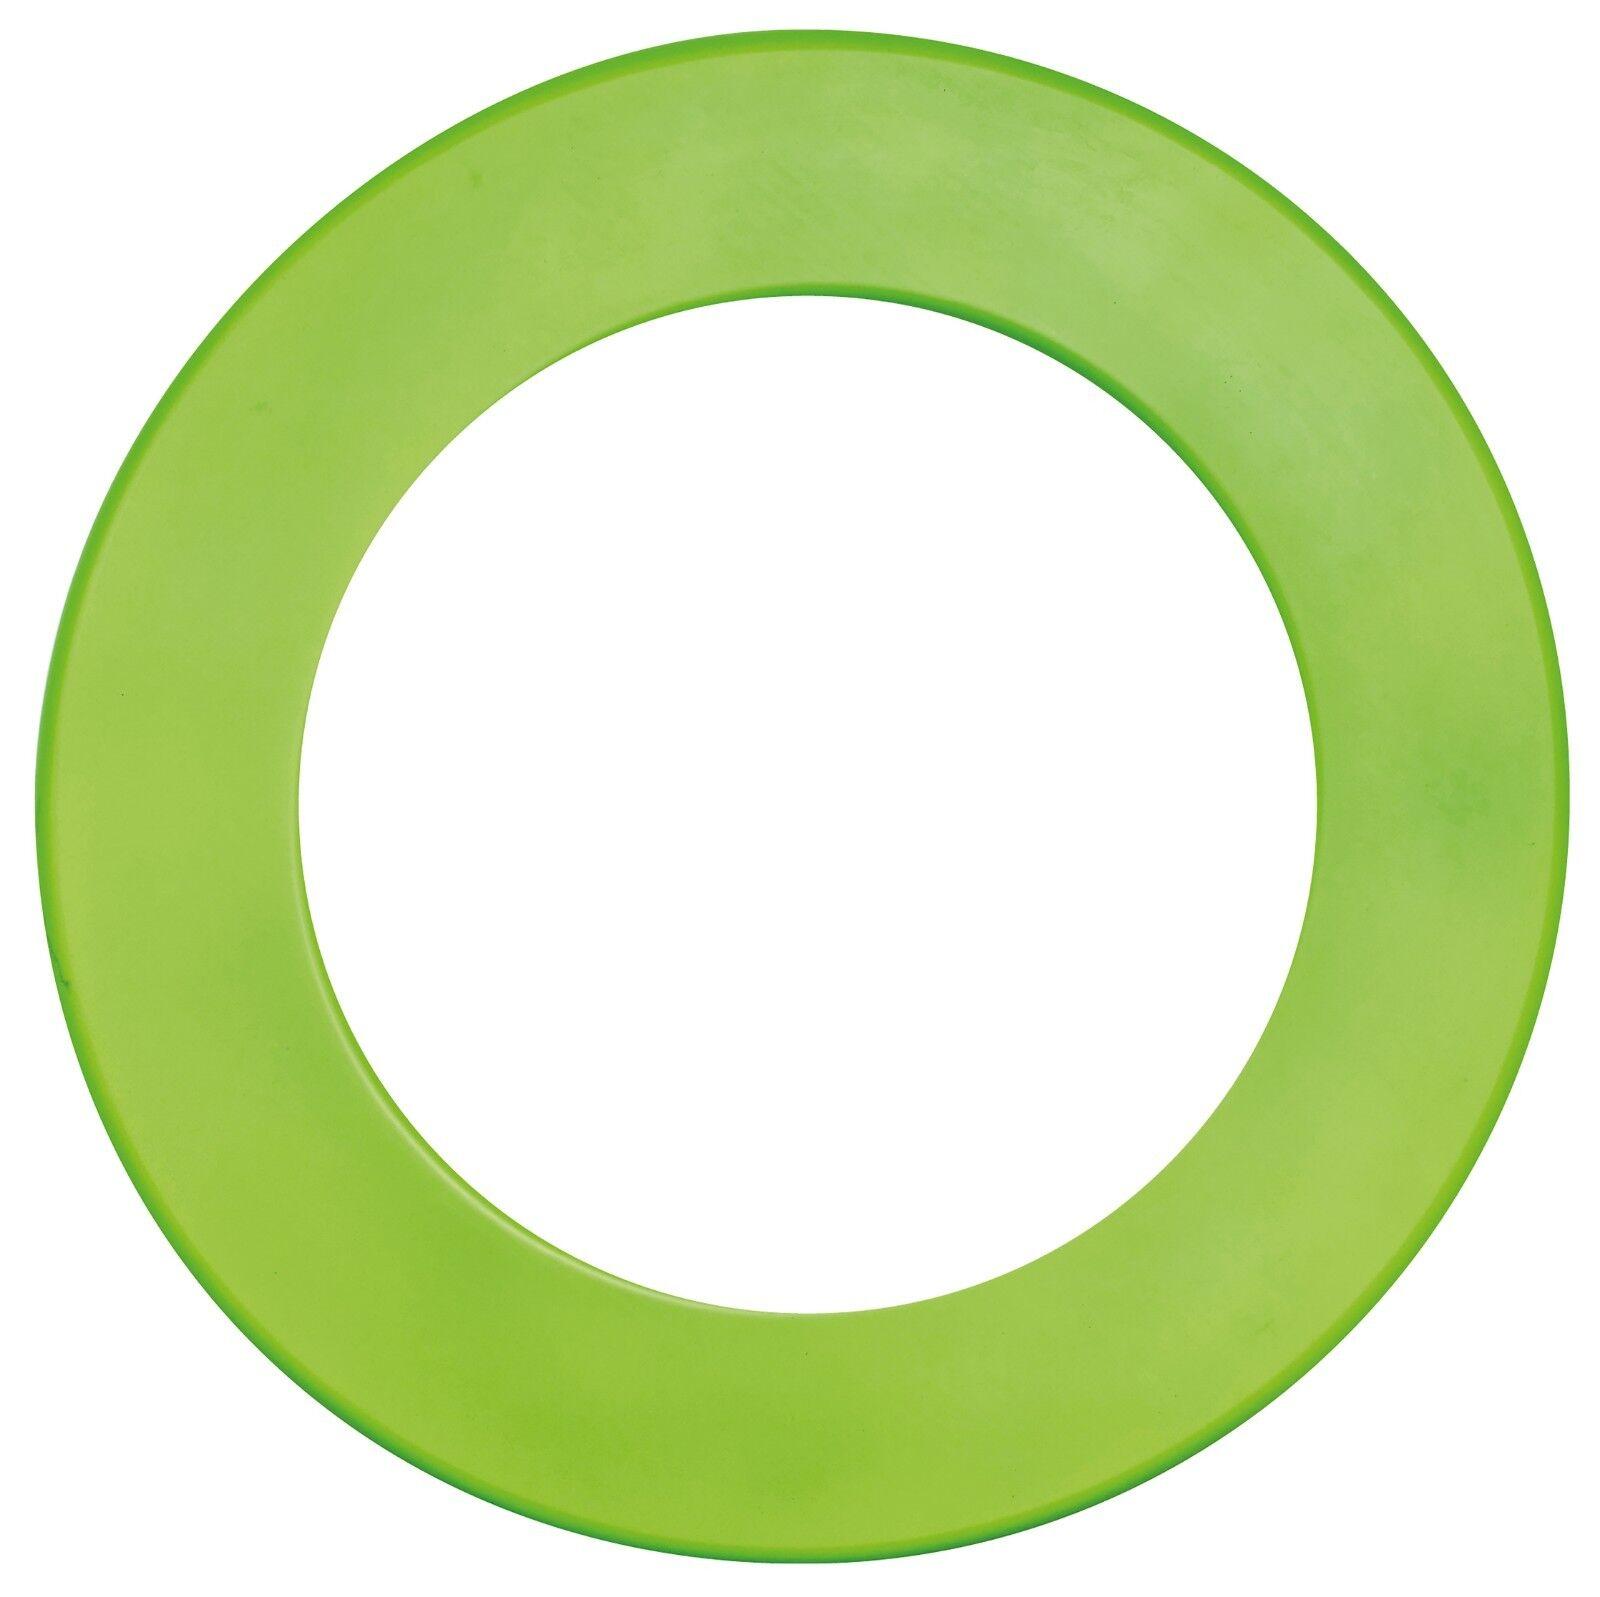 Winmau Plain Green Dartboard Surround   Dartboard Ring